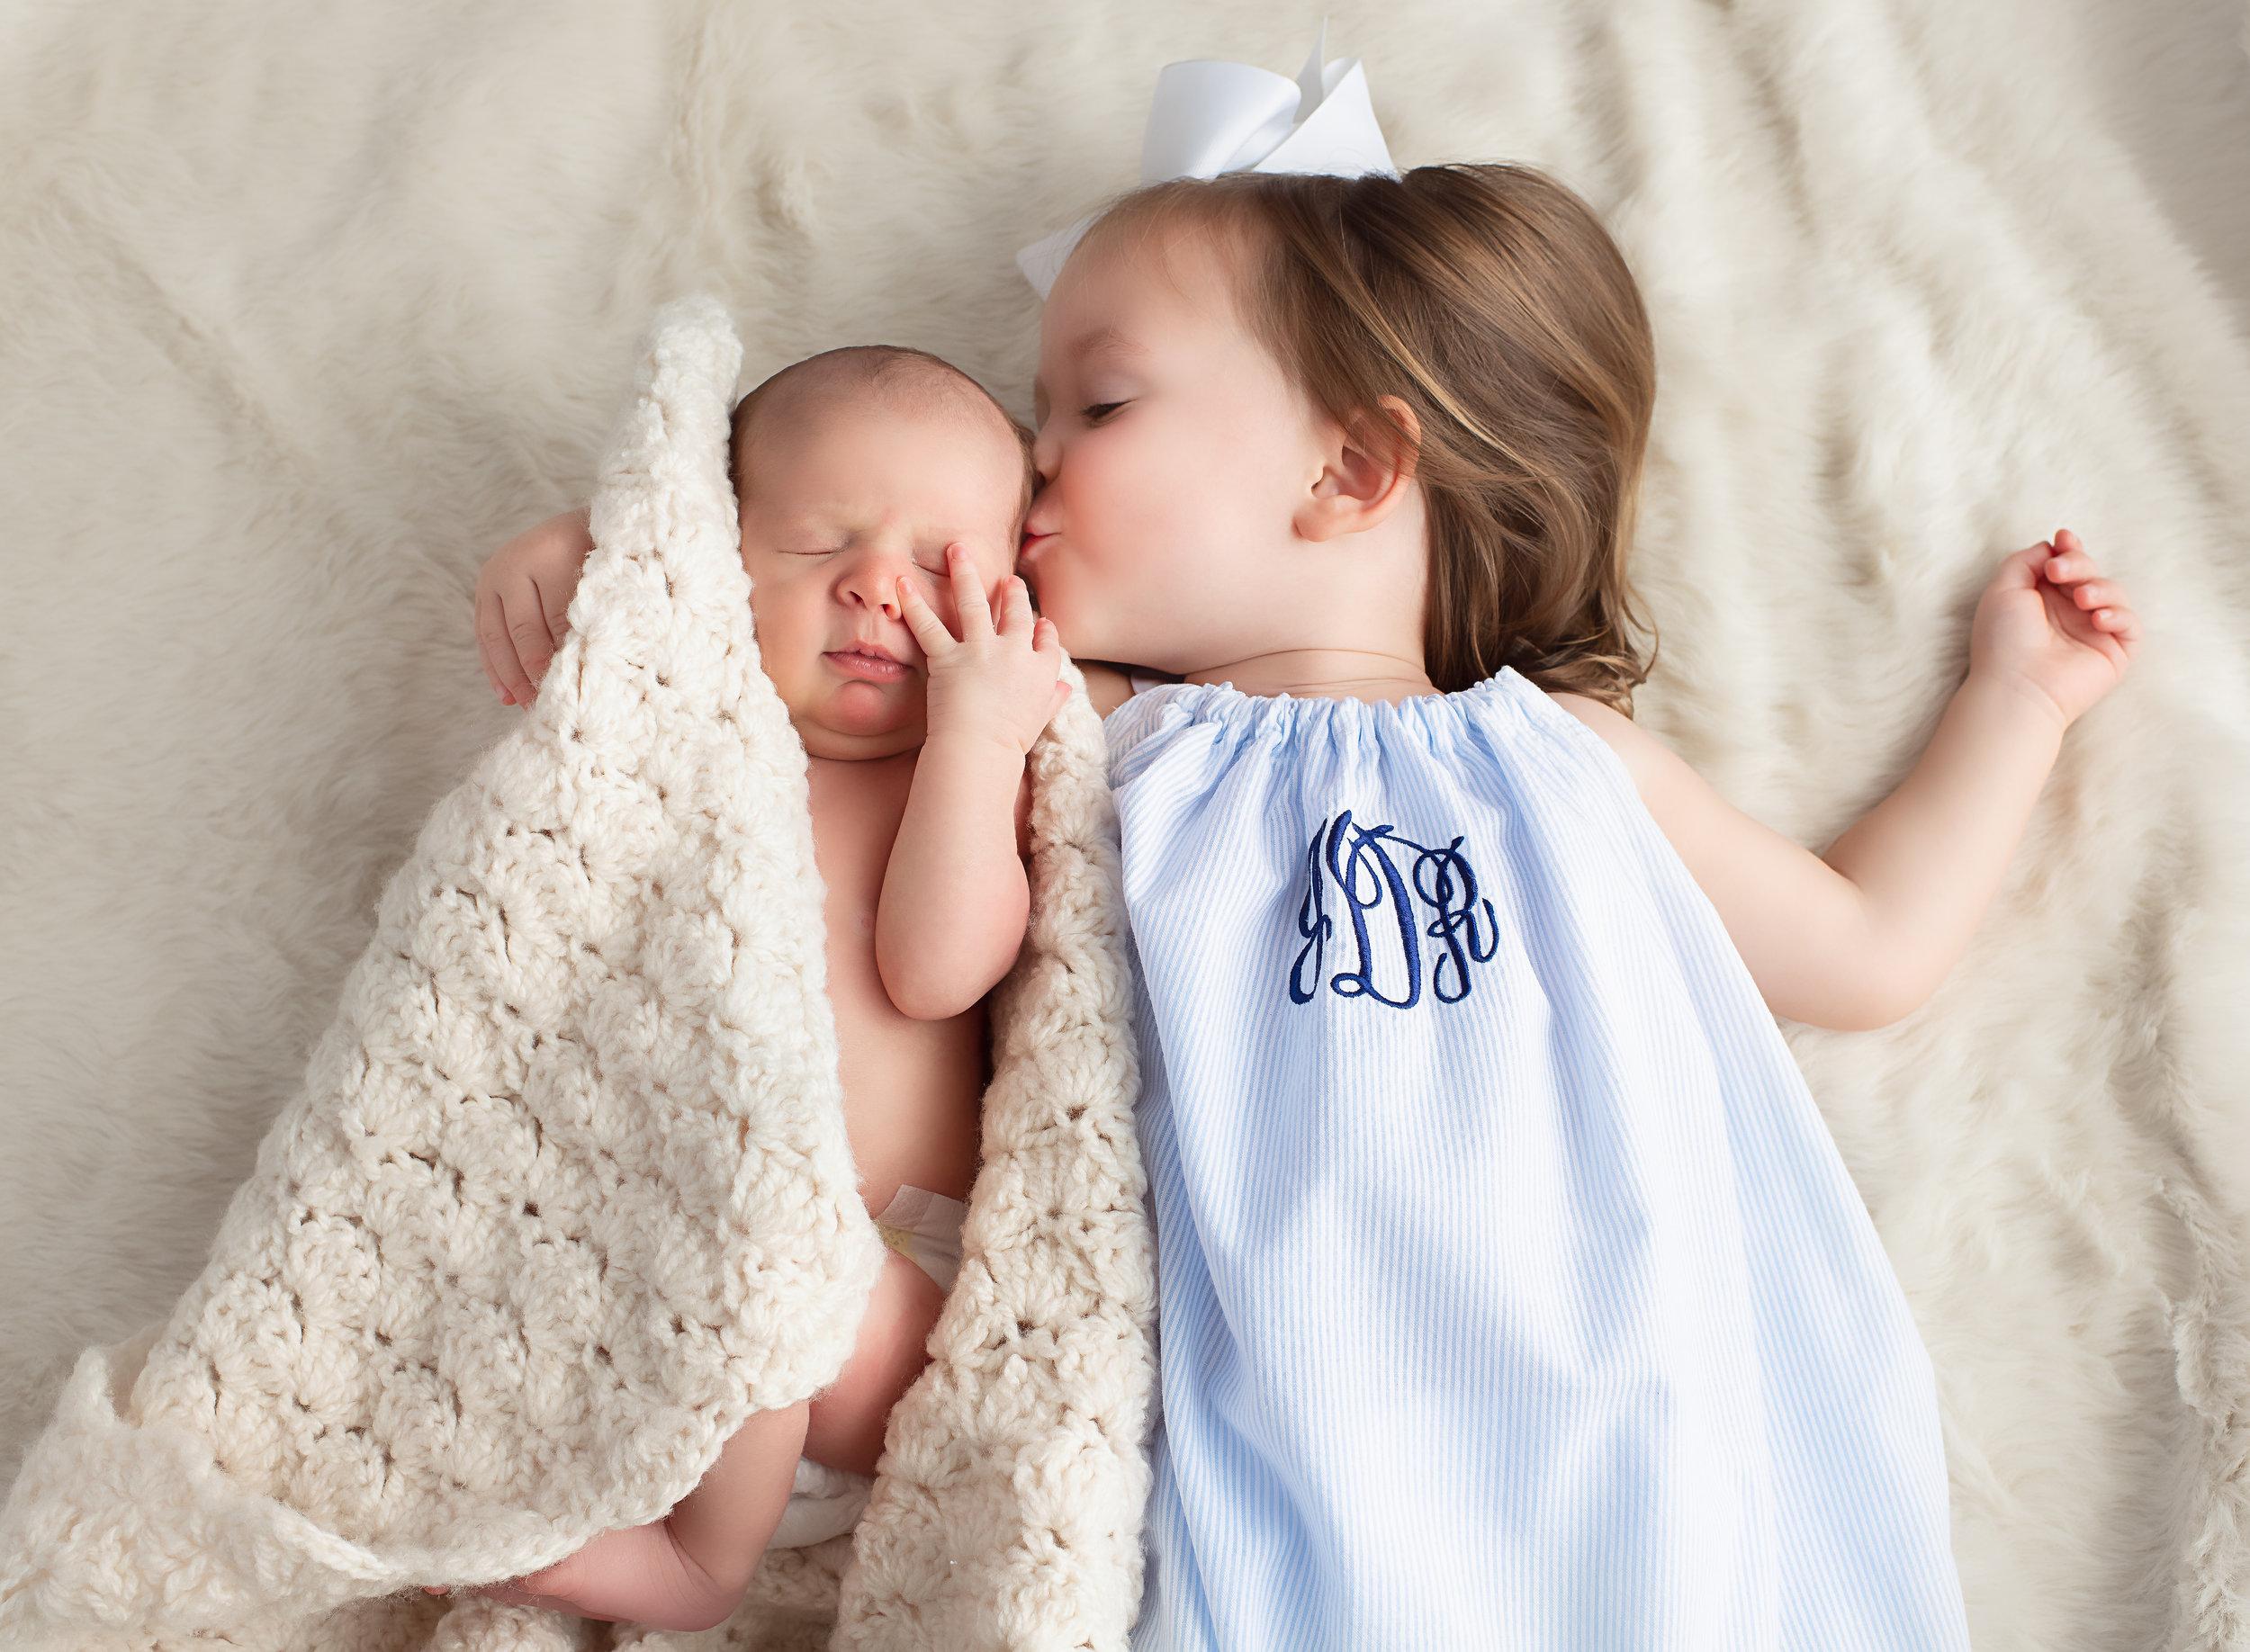 Newborn Photography in Tega Cay, SC